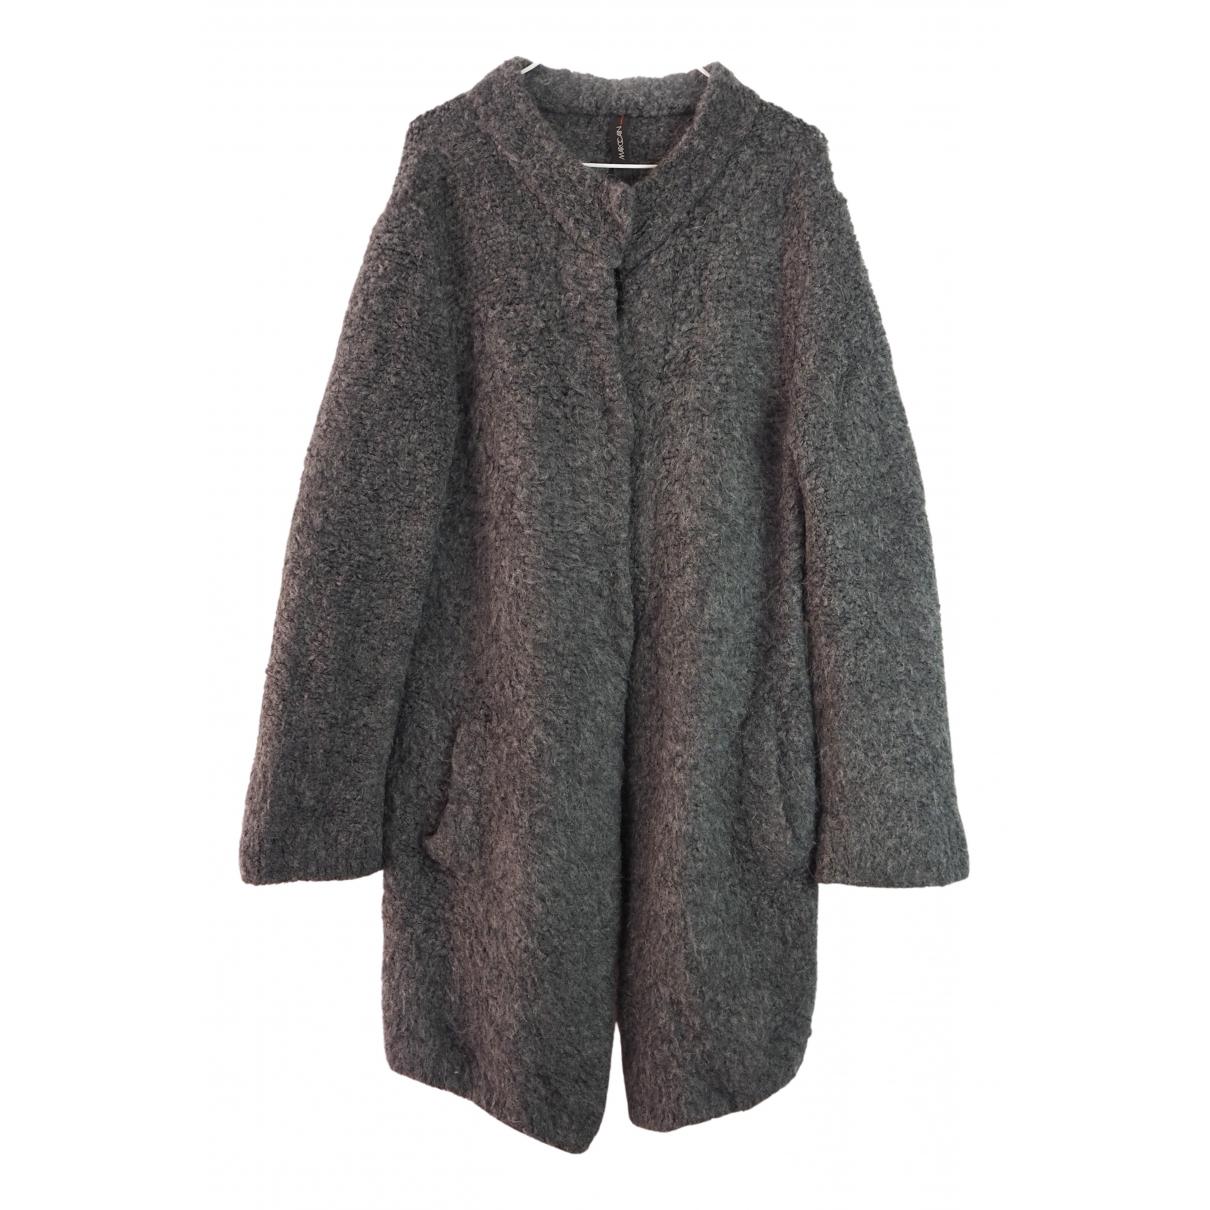 Marc Cain \N Grey coat for Women L International